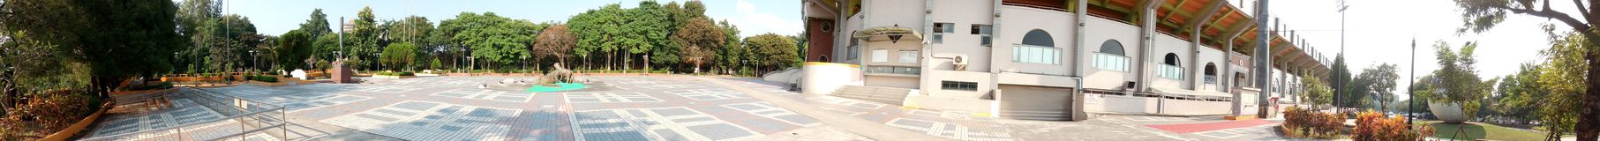 Panorama - Piazza außerhalb des Chiayi-Stadt-Baseball-Stadions lizenzfreie stockfotografie